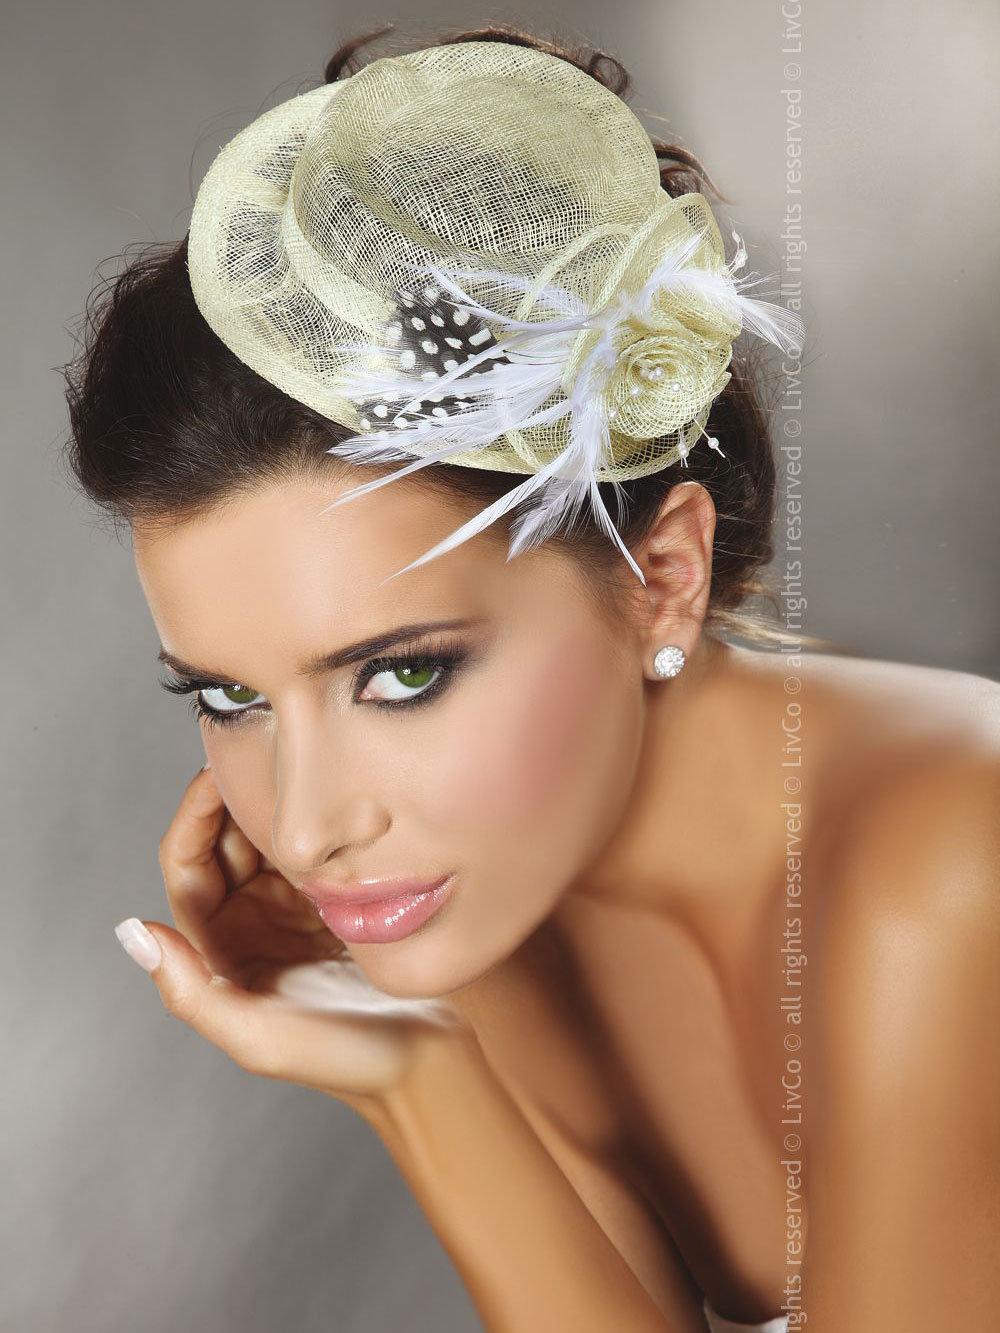 LivCo Palarie Mini Top Hat Model 30 Ivory